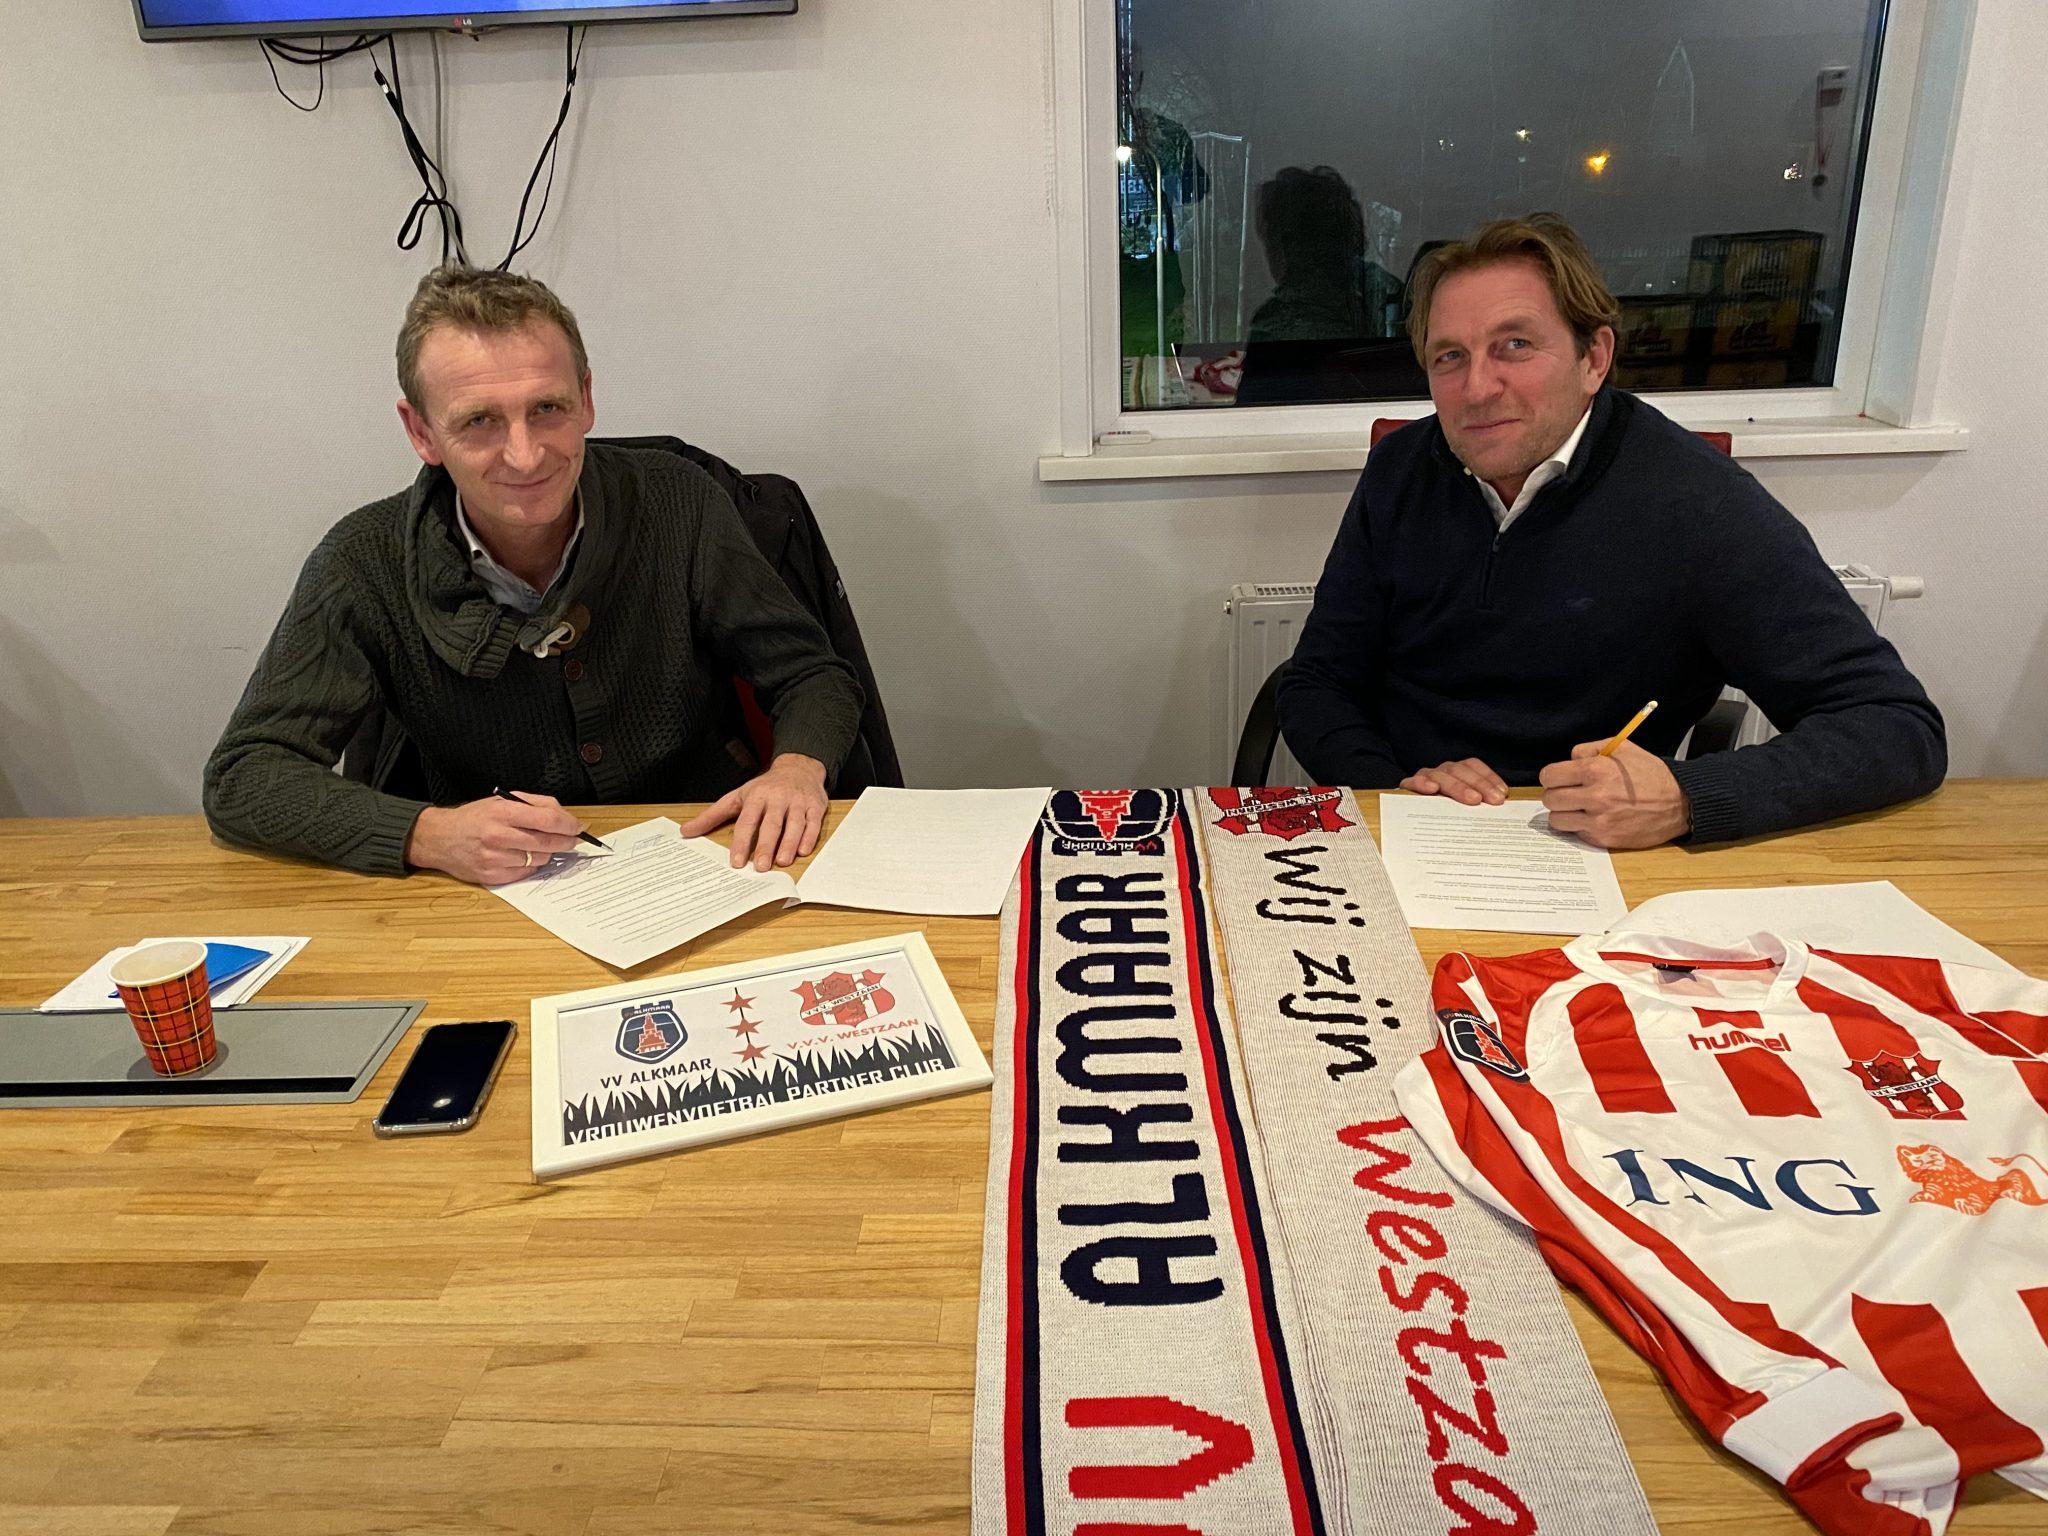 vvv Westzaan Official Partner Eredivisionist vv Alkmaar